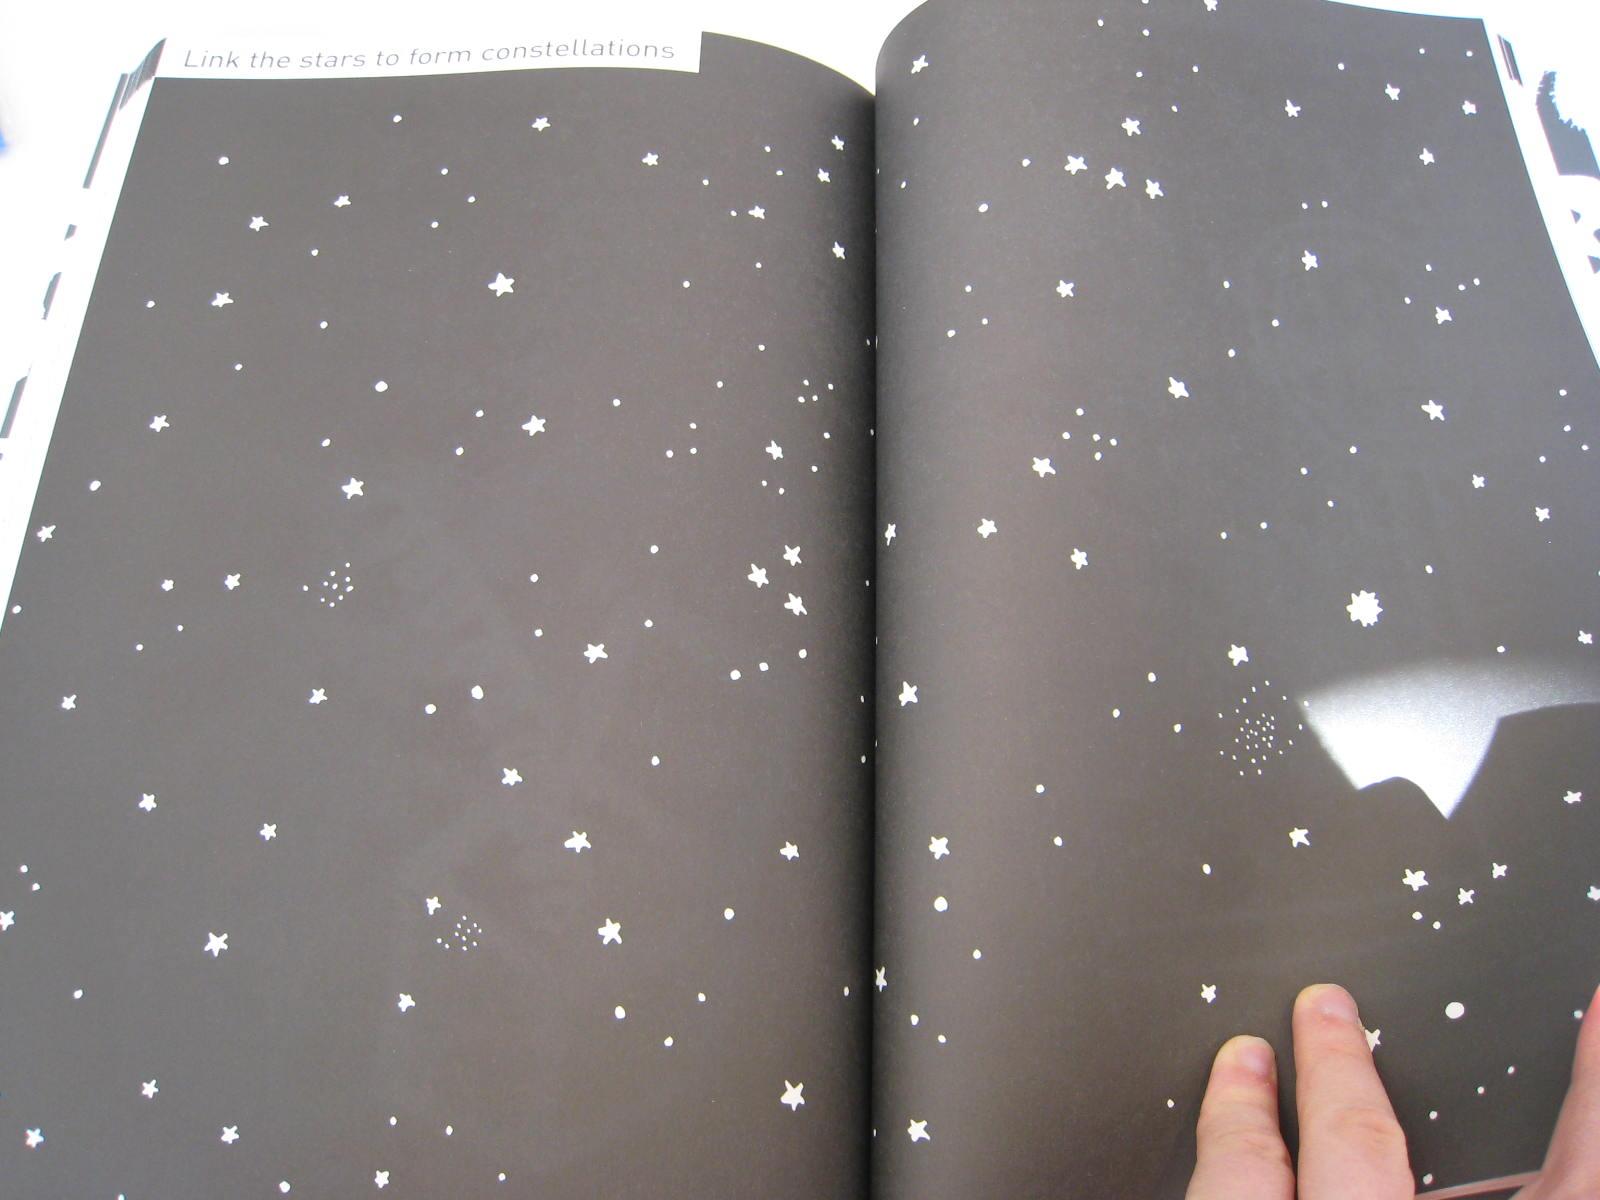 taro book - found